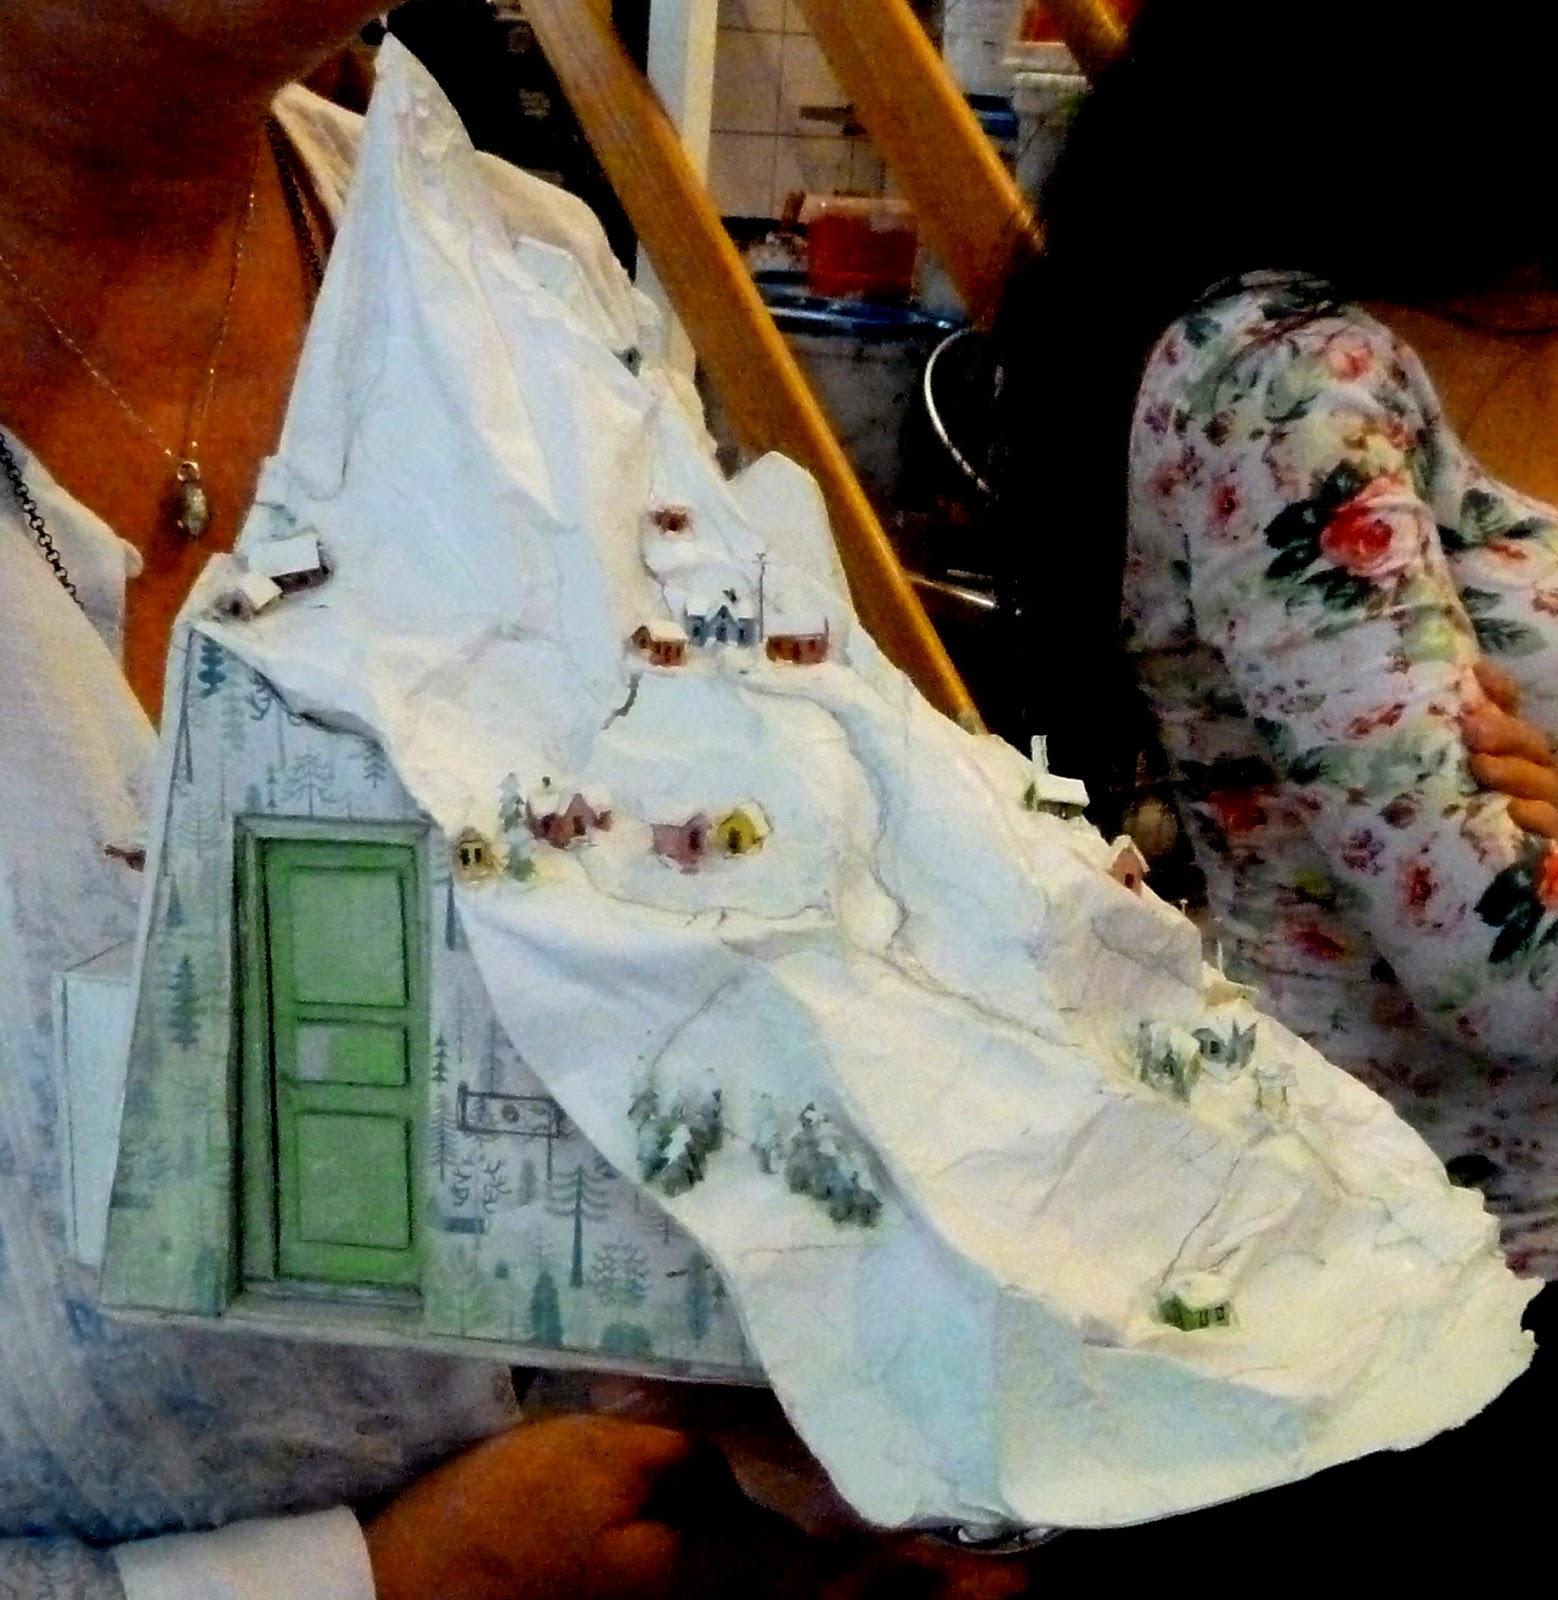 norske damer reiser til afrika Rotnes